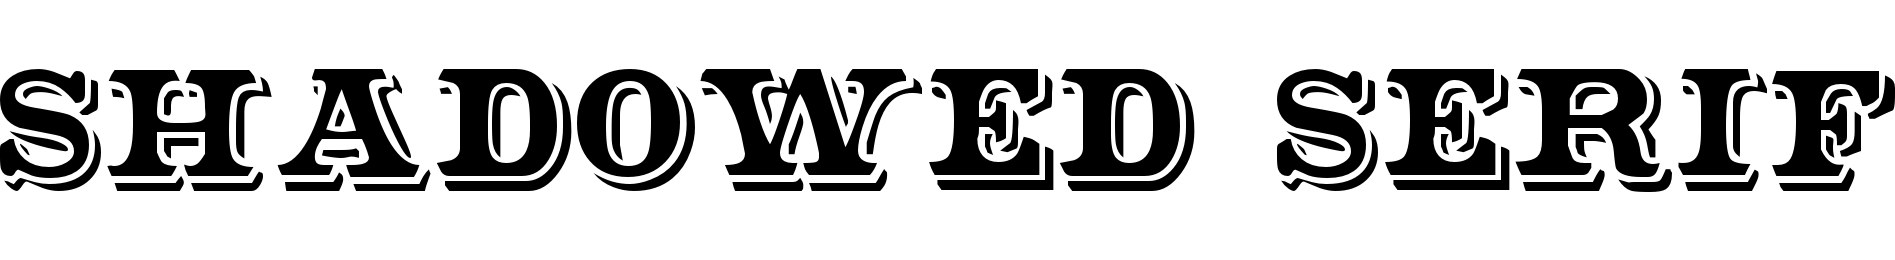 Shadowed Serif